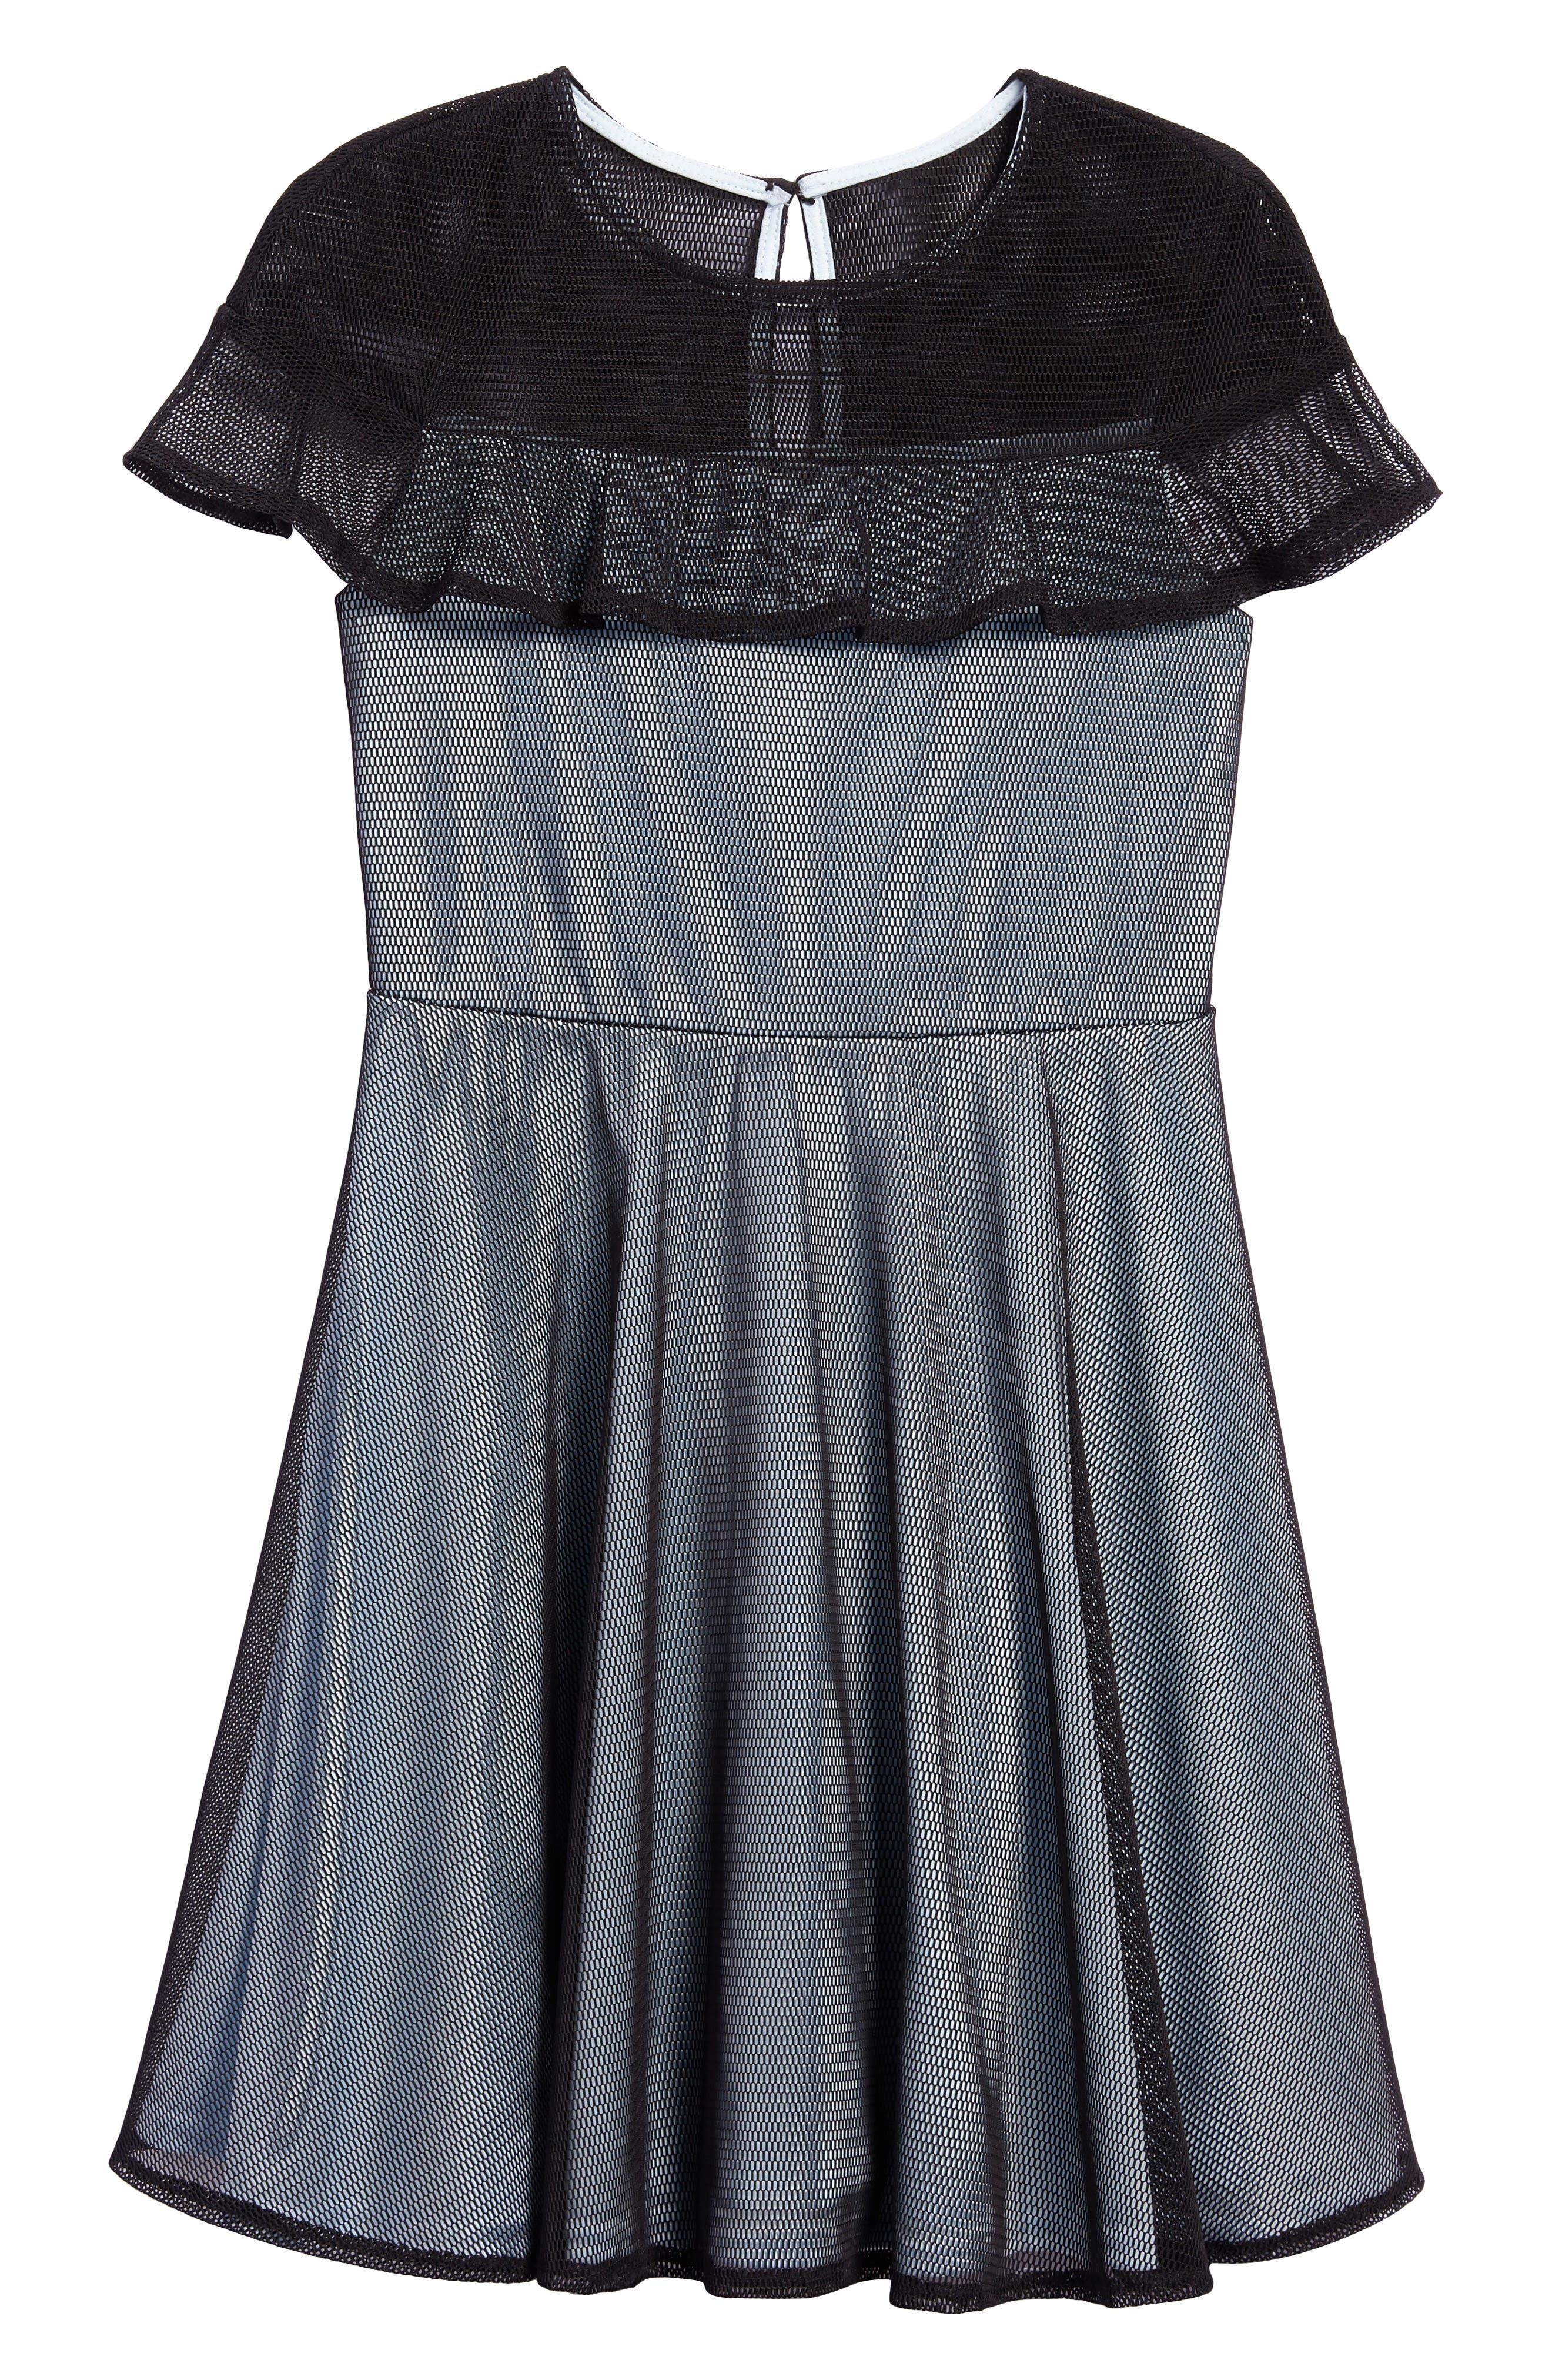 Pastourelle by Pippa & Julie Ruffle Mesh Overlay Dress (Big Girls)